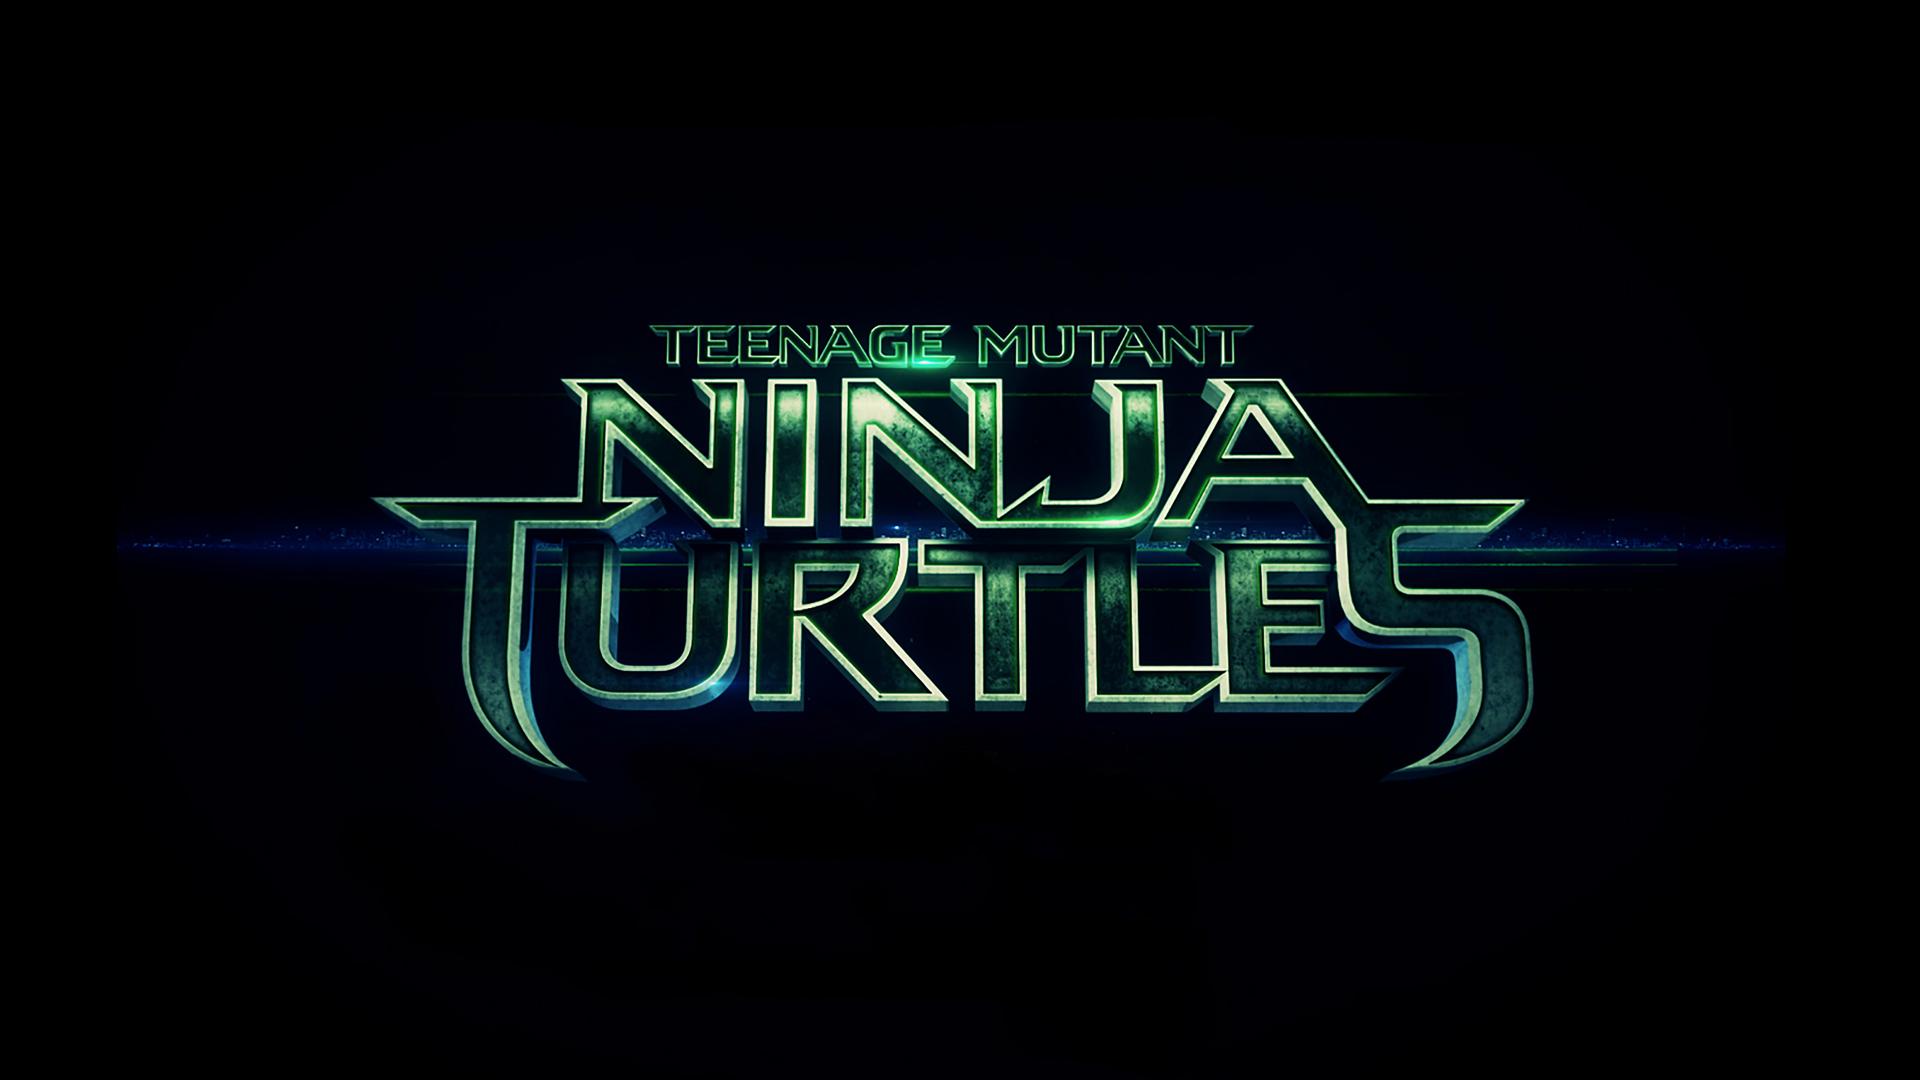 Free Download Teenage Mutant Ninja Turtles 2014 Hd Wallpaper